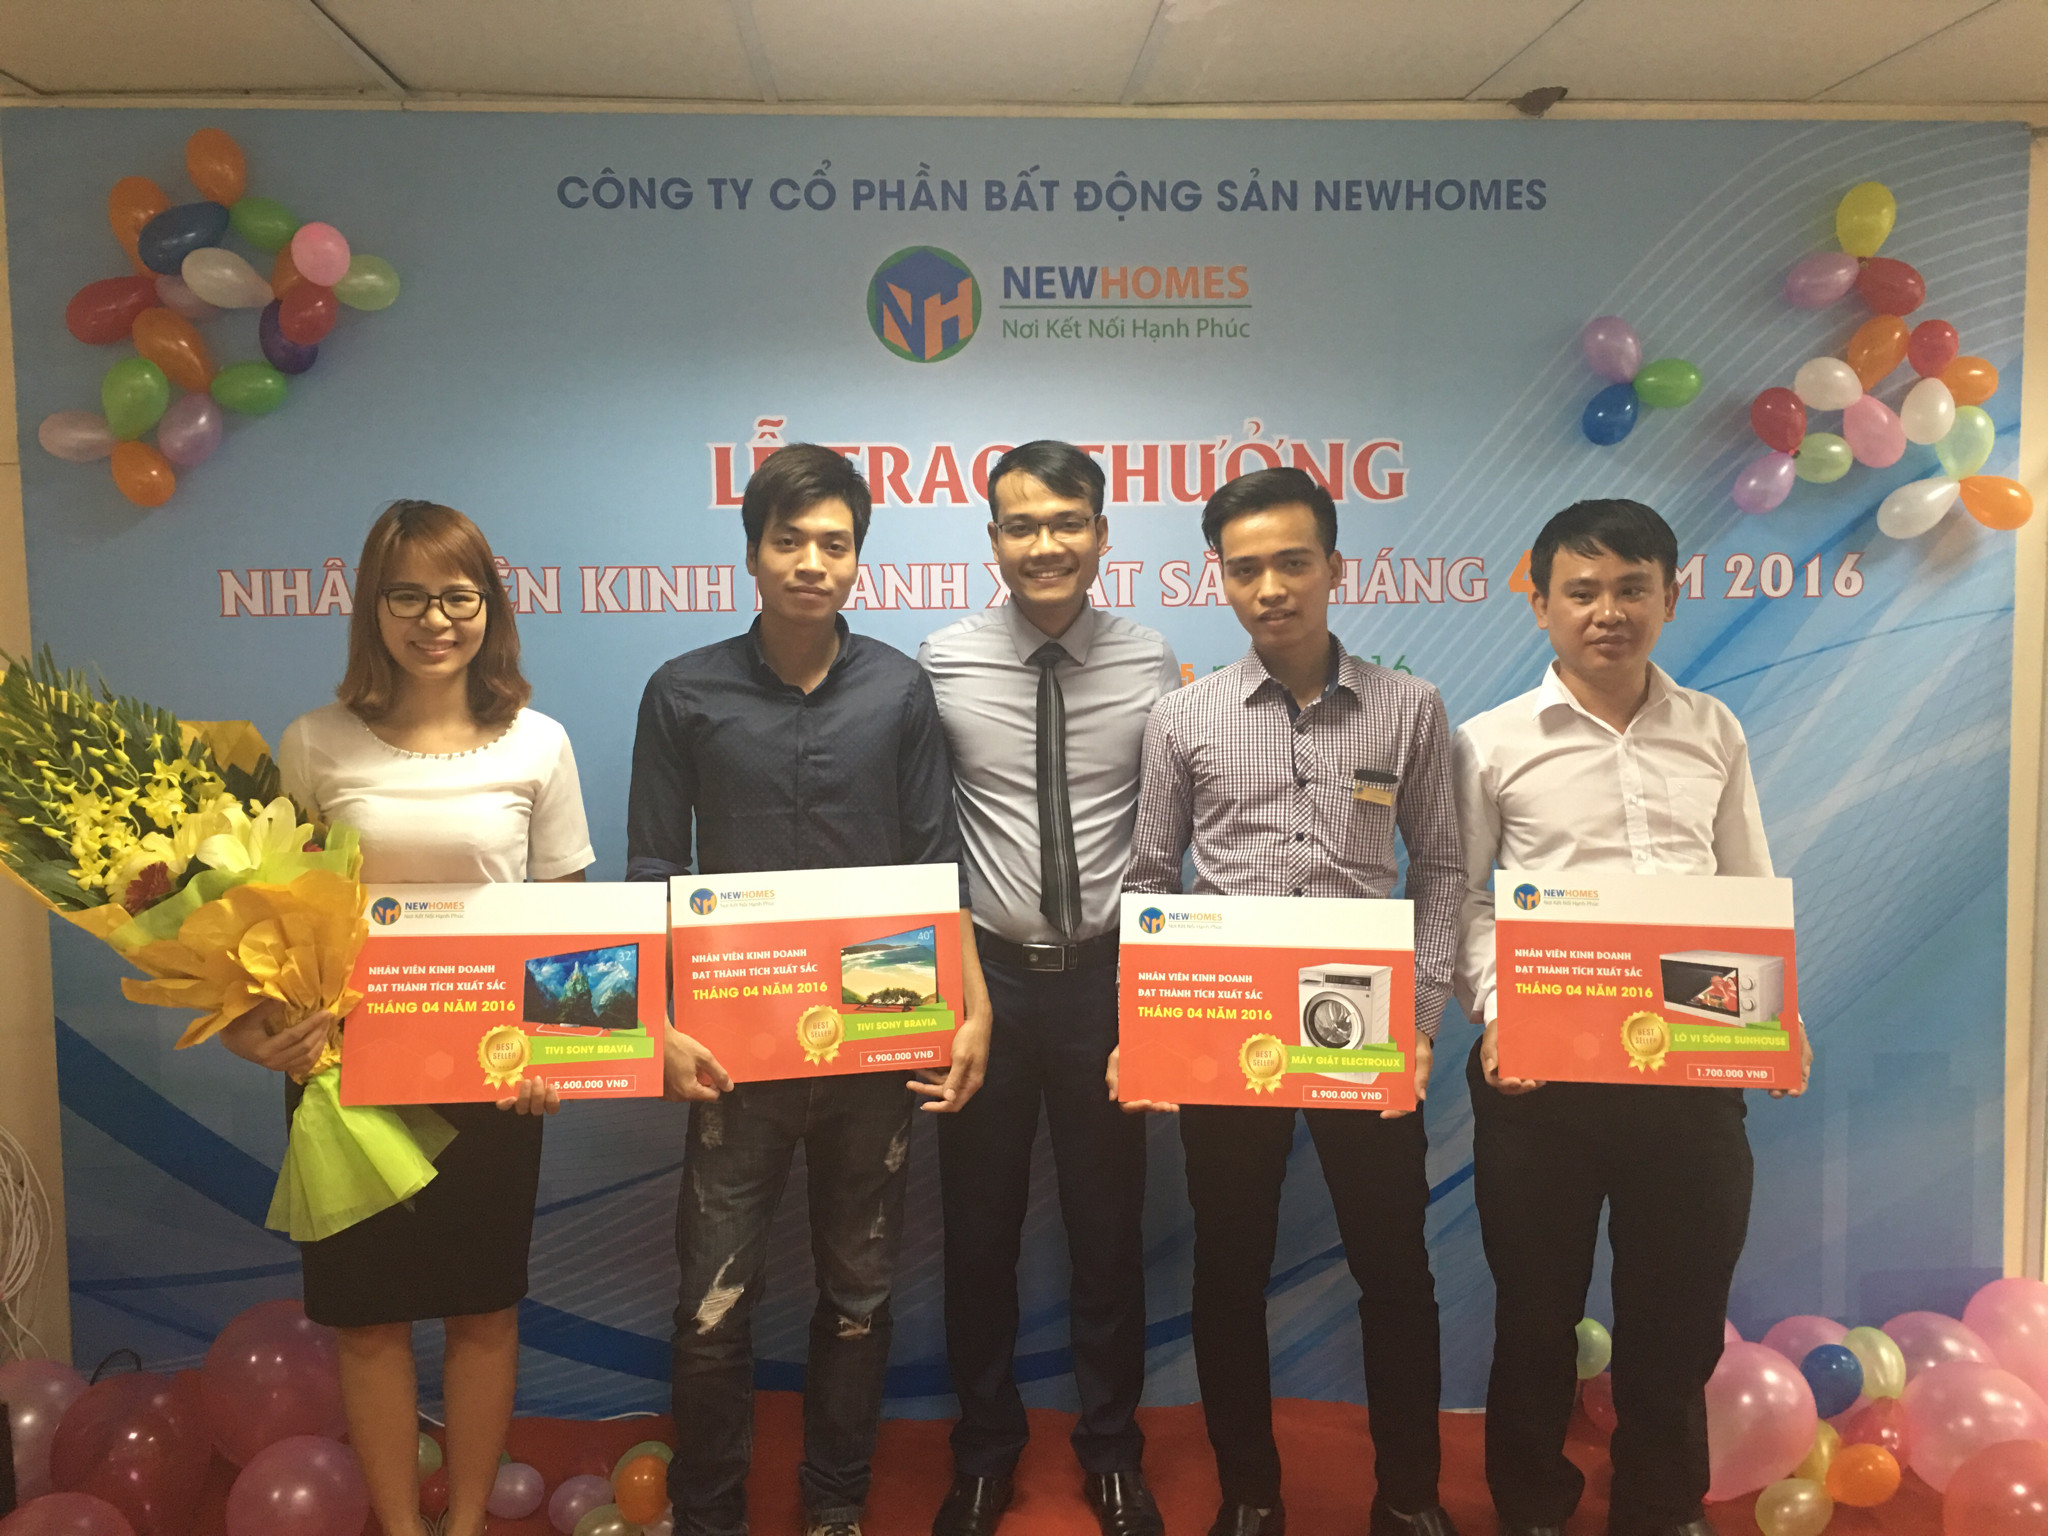 giam-doc-new-homes-trao-thuong-cho-nhan-vien-kinh-doanh-xuat-sac